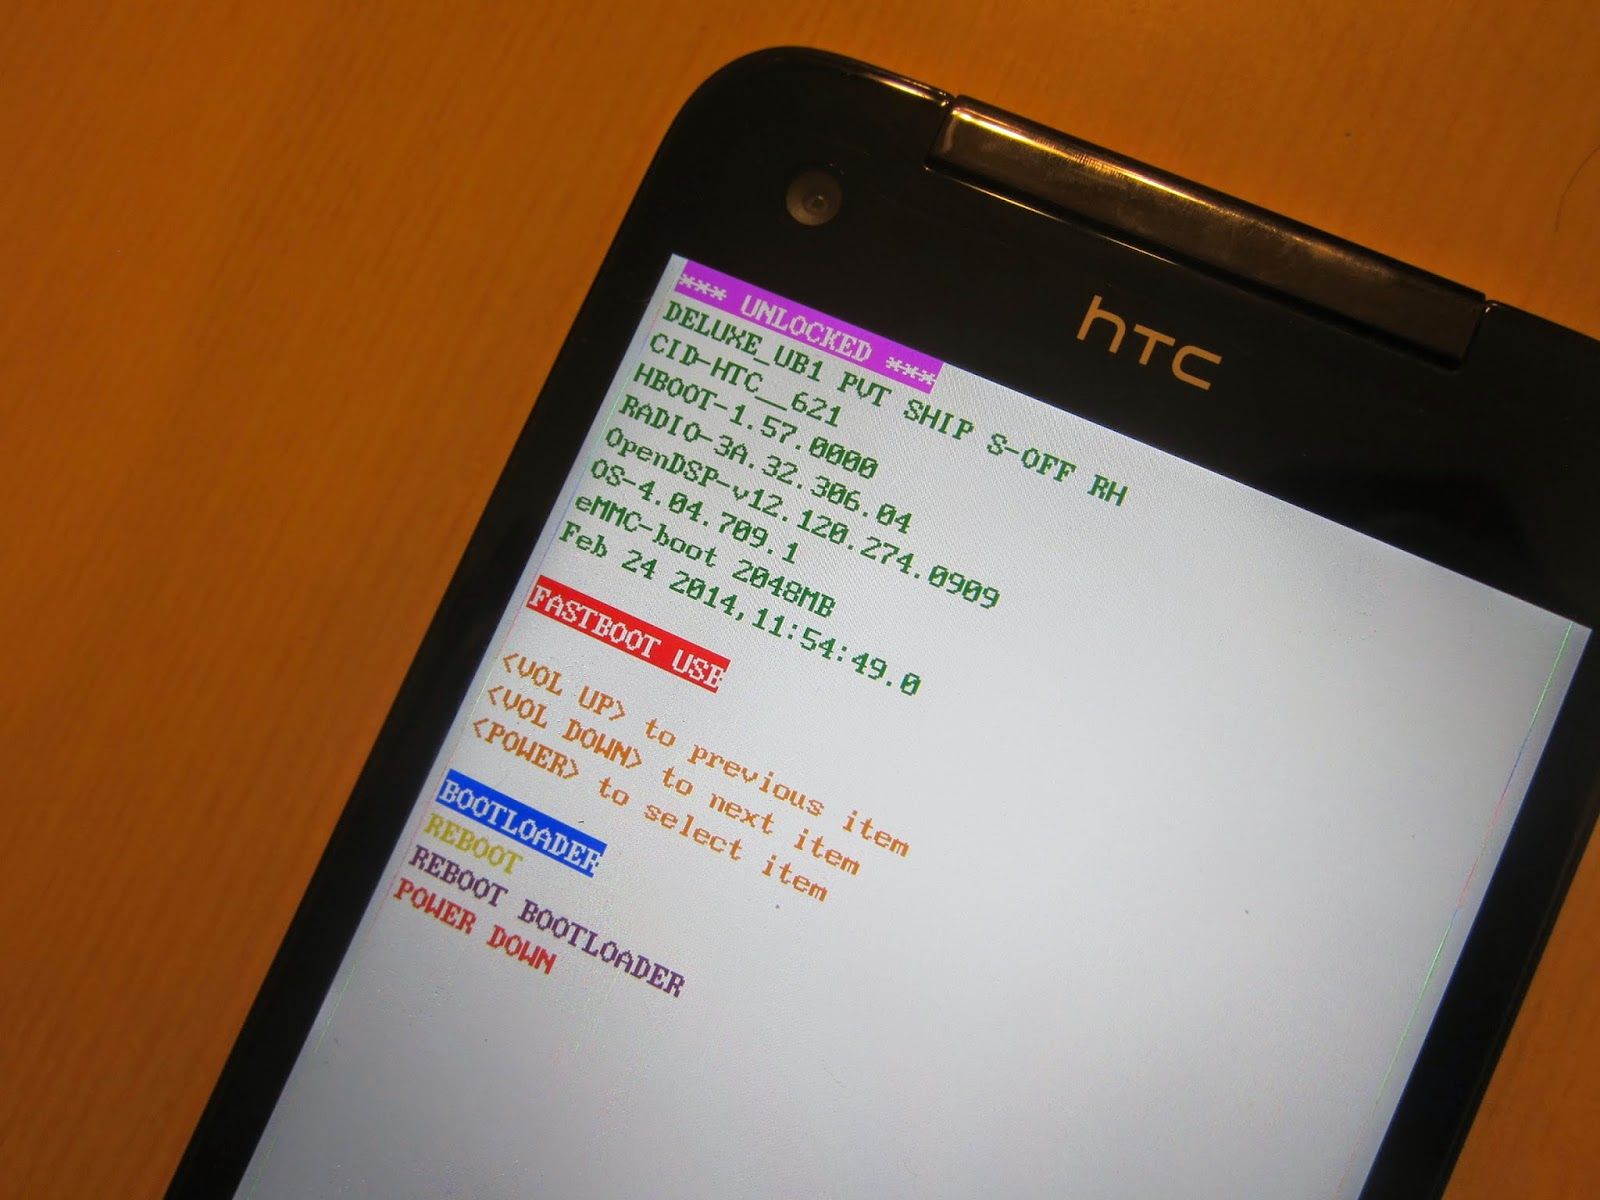 IMG 2325 - 【圖文教學】HTC Butterfly 4.3/4.4 解鎖+ROOT